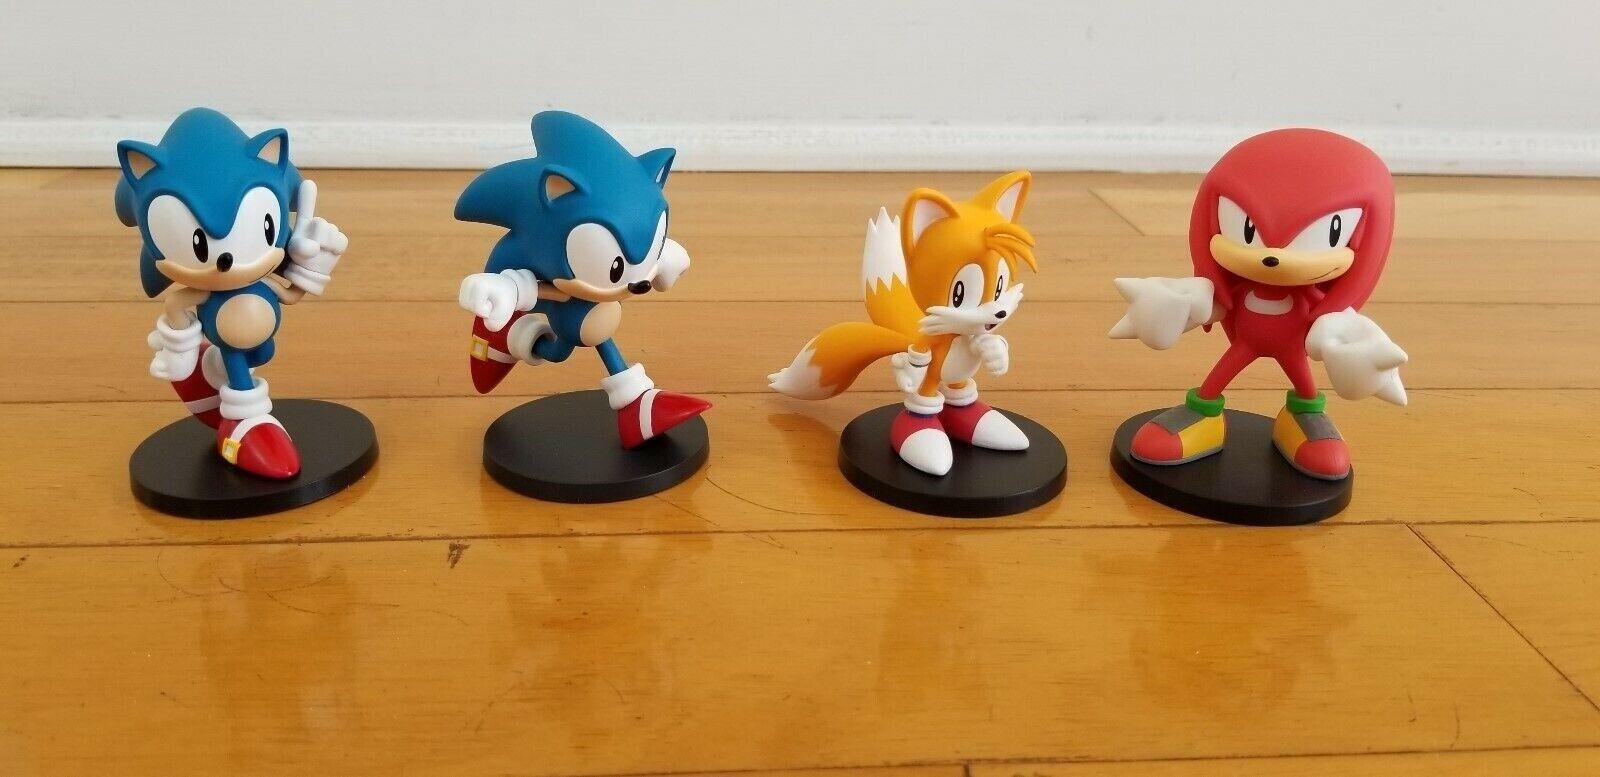 Sonic the Hedgehog Boom8 Series Vol 1 + 2 + 3 + 4 pvc figures (set of 4)